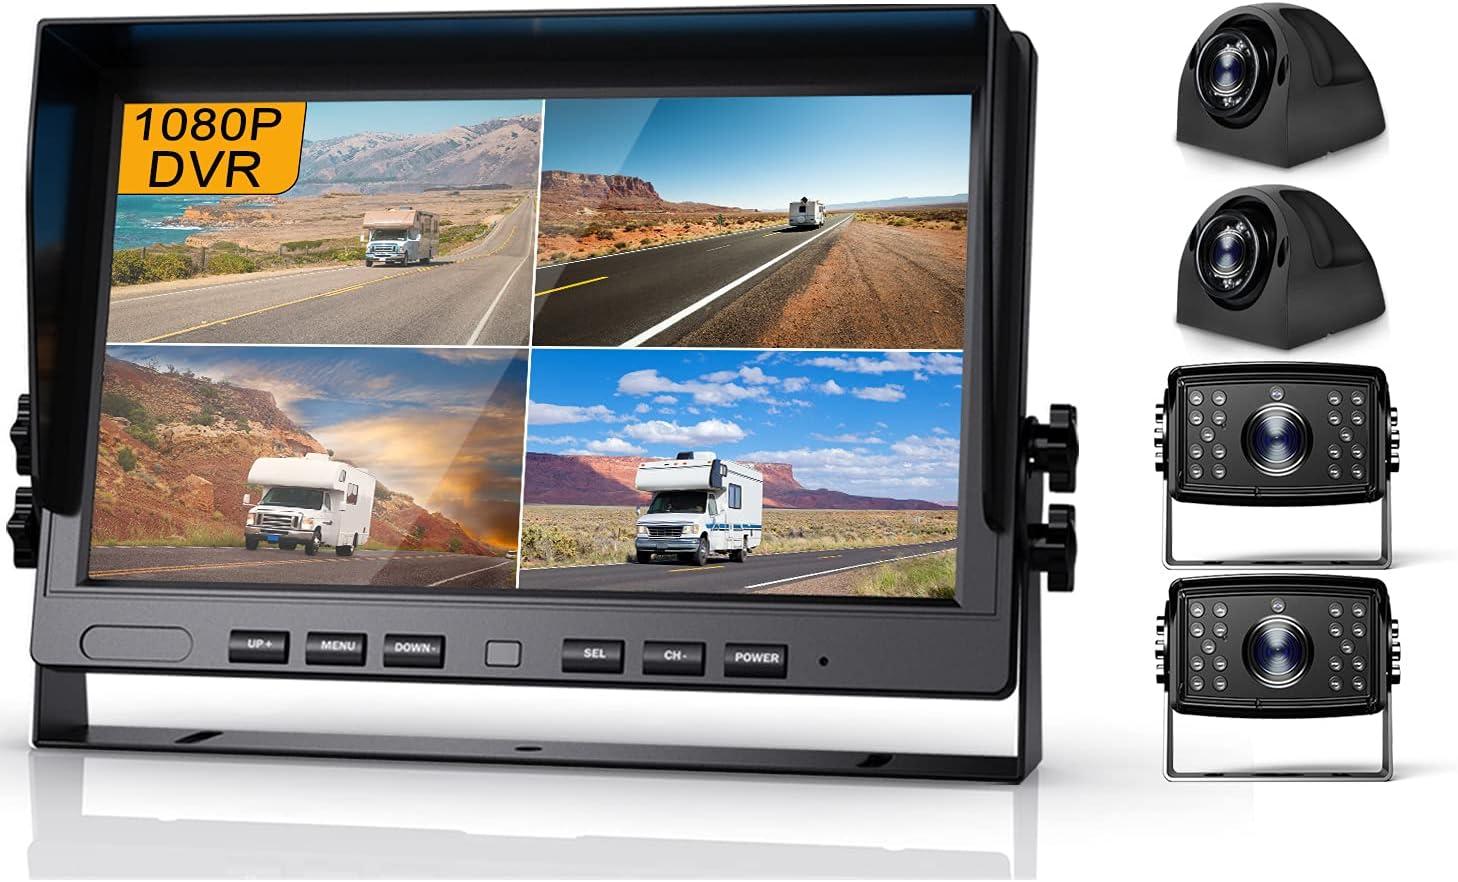 Fursom 10.2'' 1080P DVR Wired Backup Camera System Kit, HD Quad Split Monitor, Waterproof Side Rear View Car Reversing Camera x 4 for Large Vehicles, Trailer, Van, Camper, Box Truck, RV, Bus